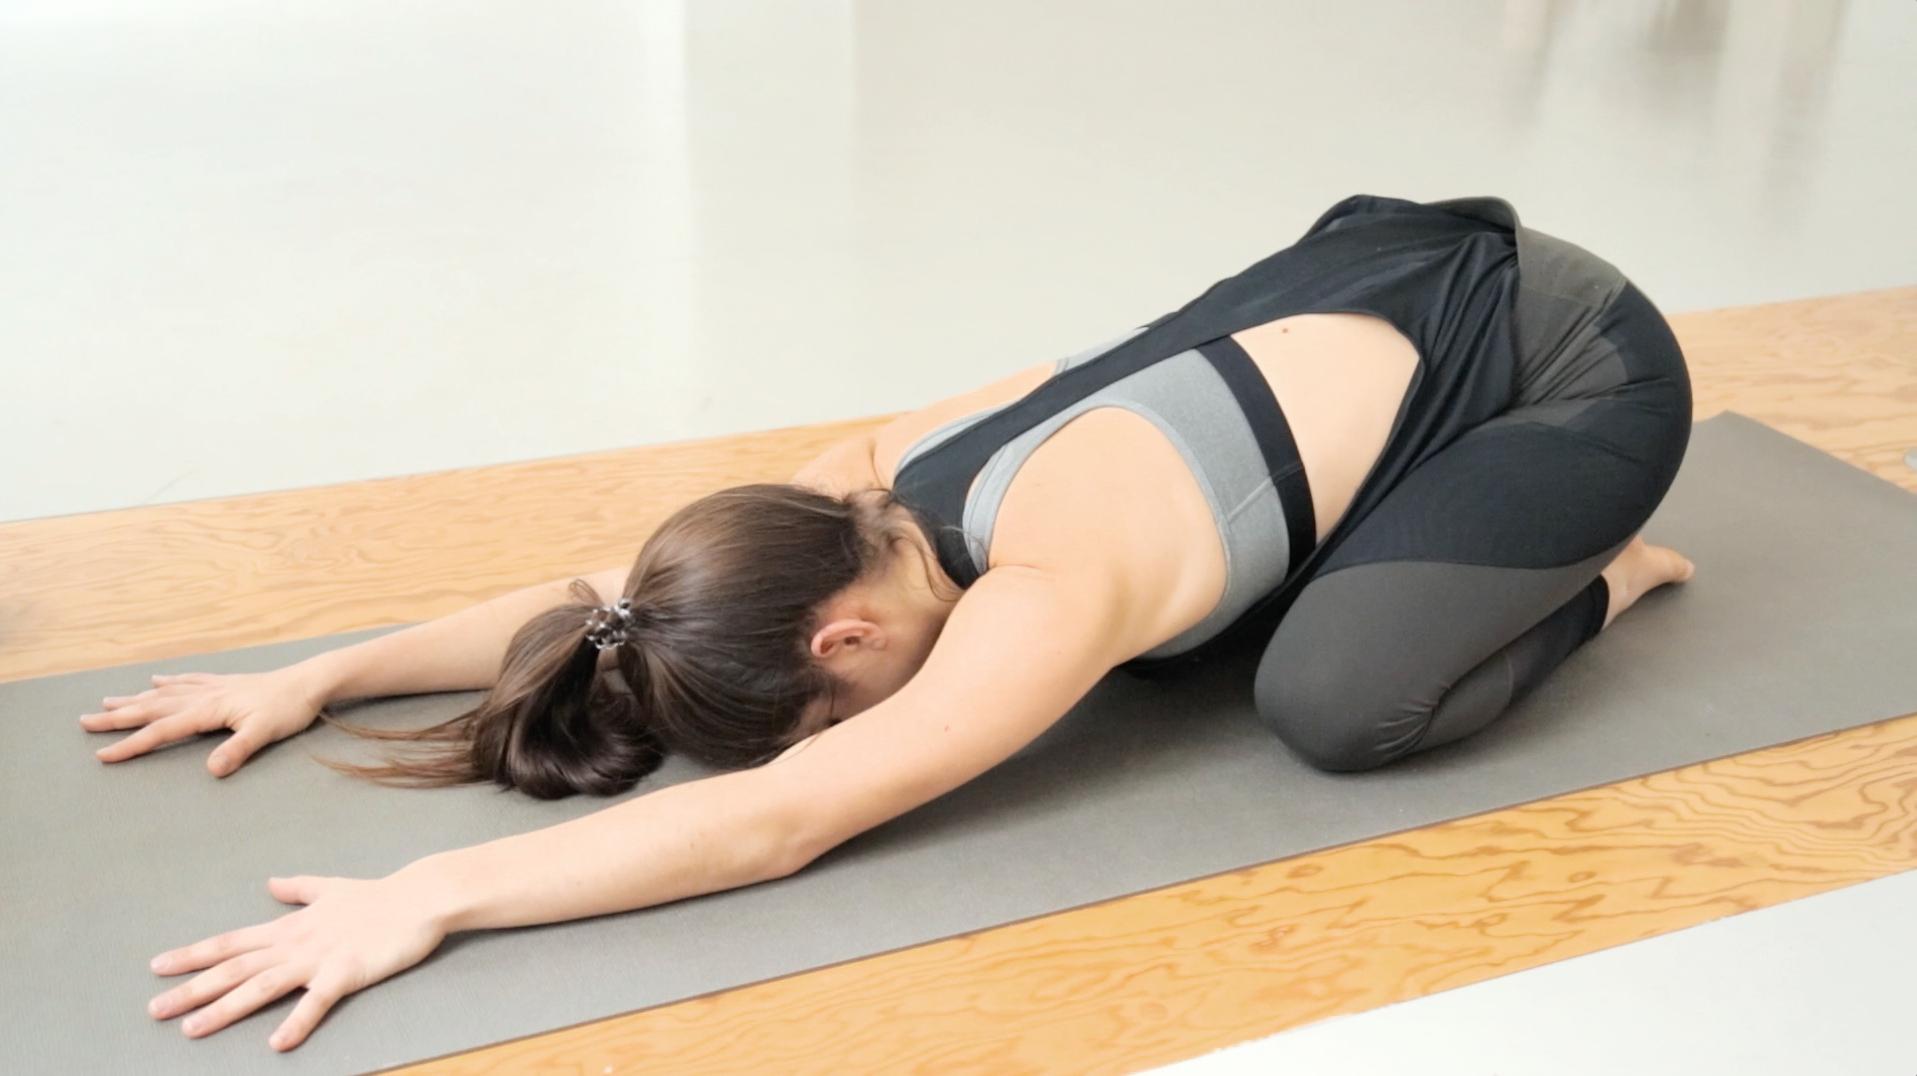 beine-po-booty-yoga-mady-morrison-05